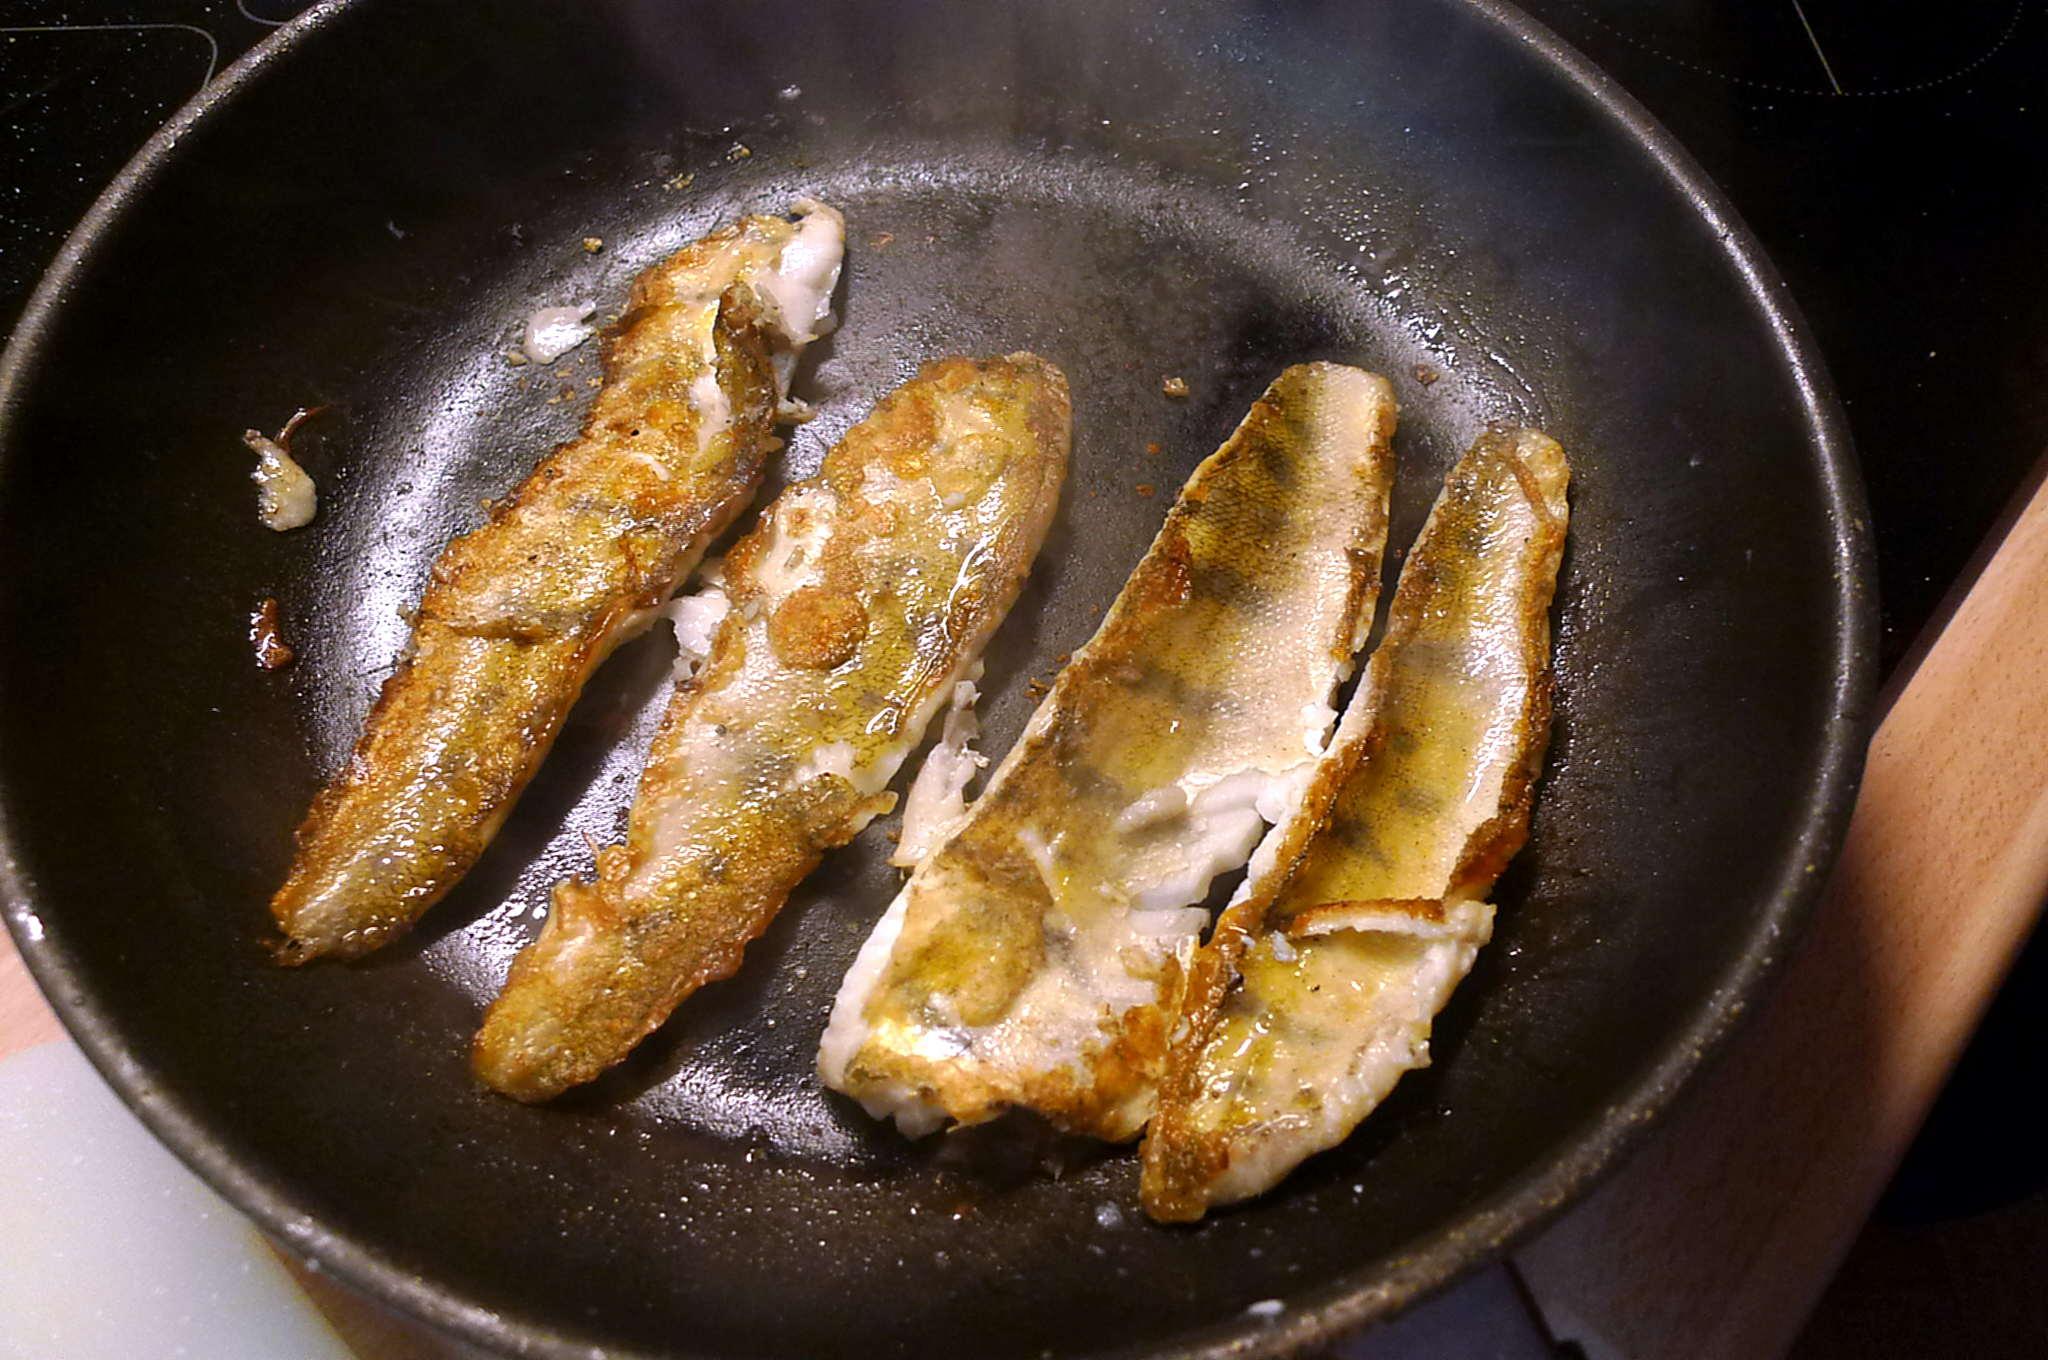 9.2.16 - Zander,Salat,Kartoffel,pescetarisch (1c) (1l)